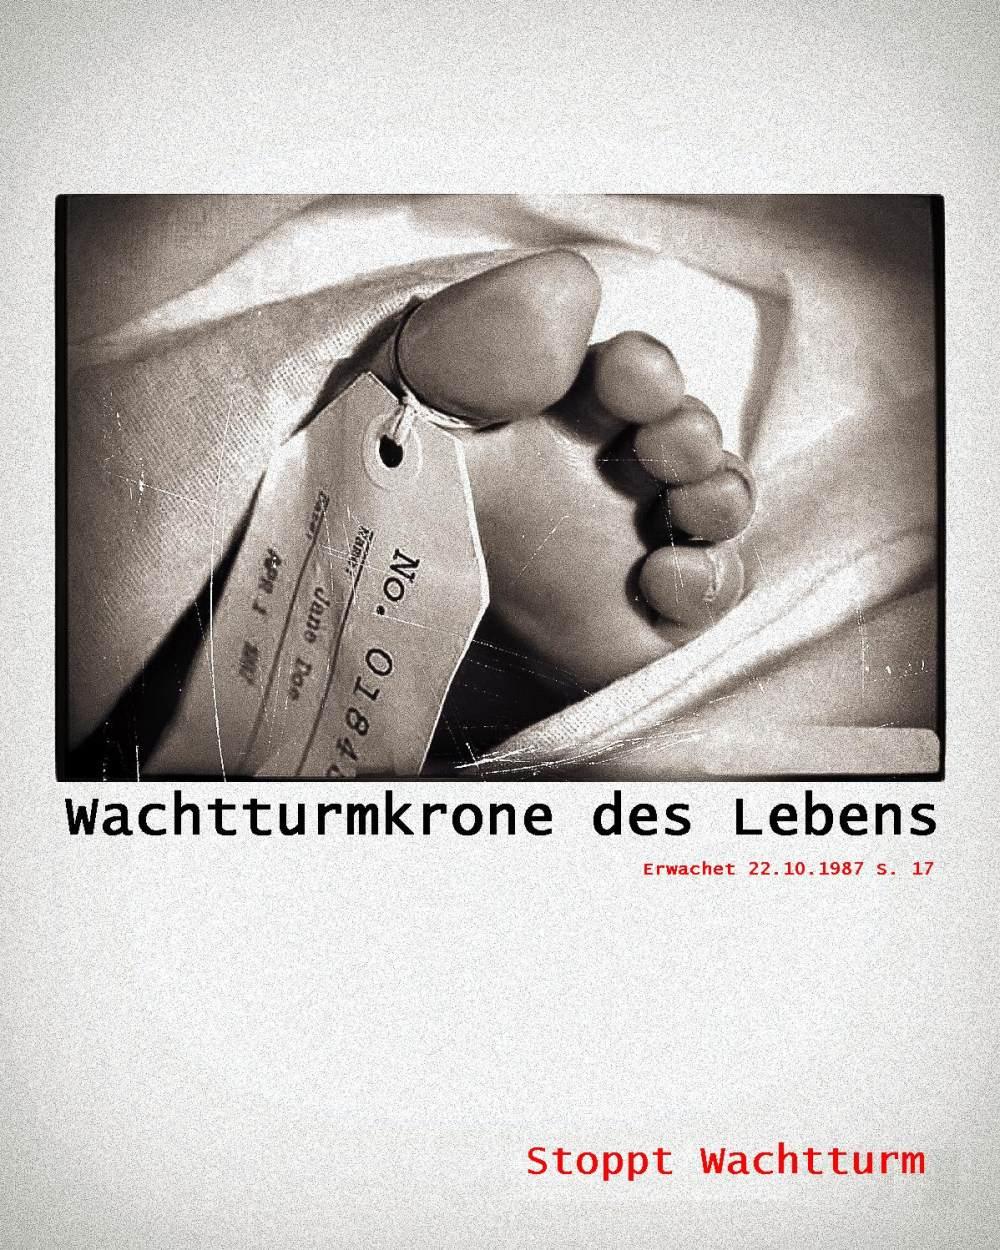 picture: http://www.manfred-gebhard.de/Wachtturmkrone.jpg